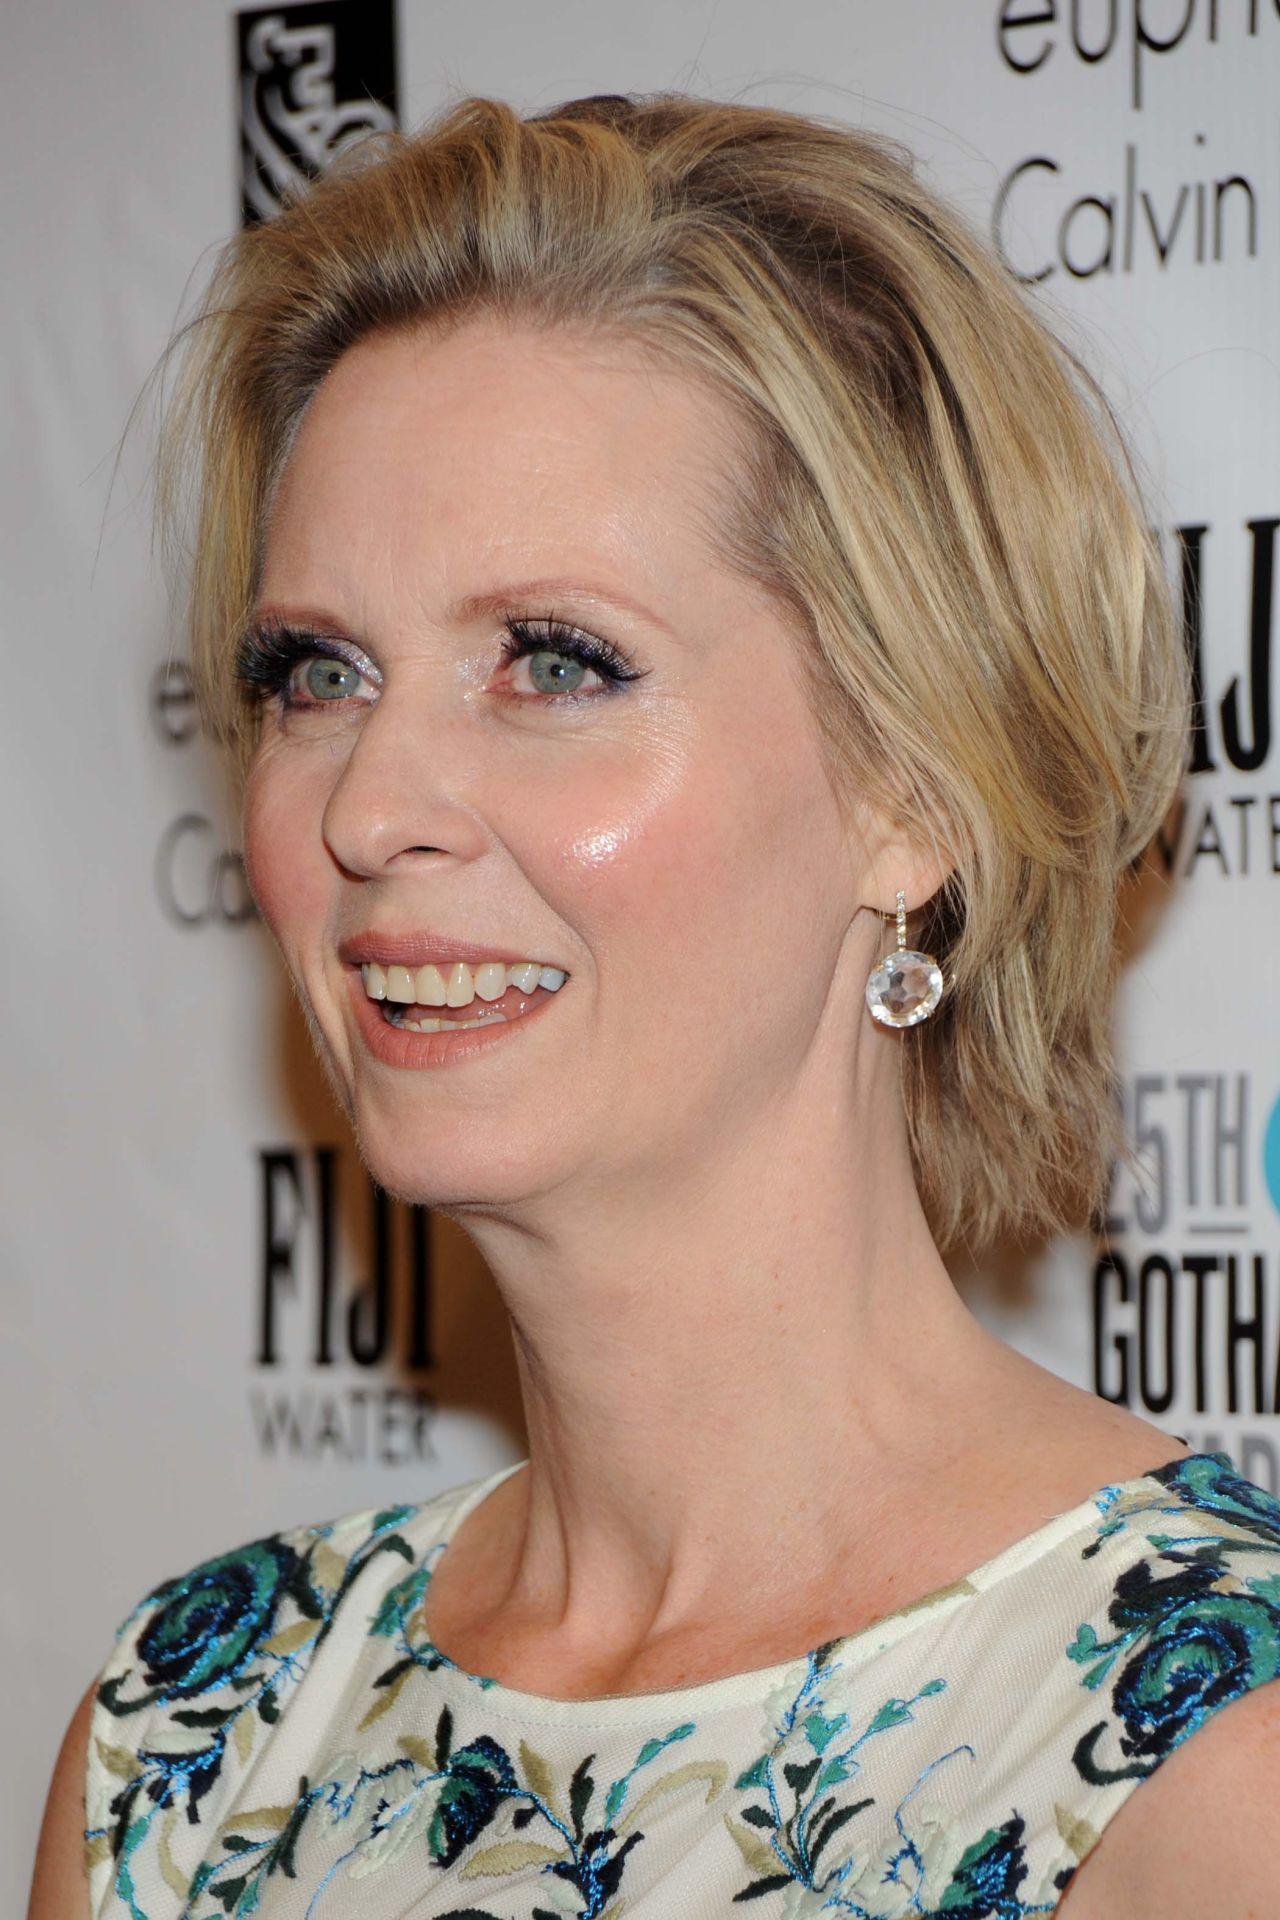 Cynthia Nixon 2015 Ifp Gotham Independent Film Awards In